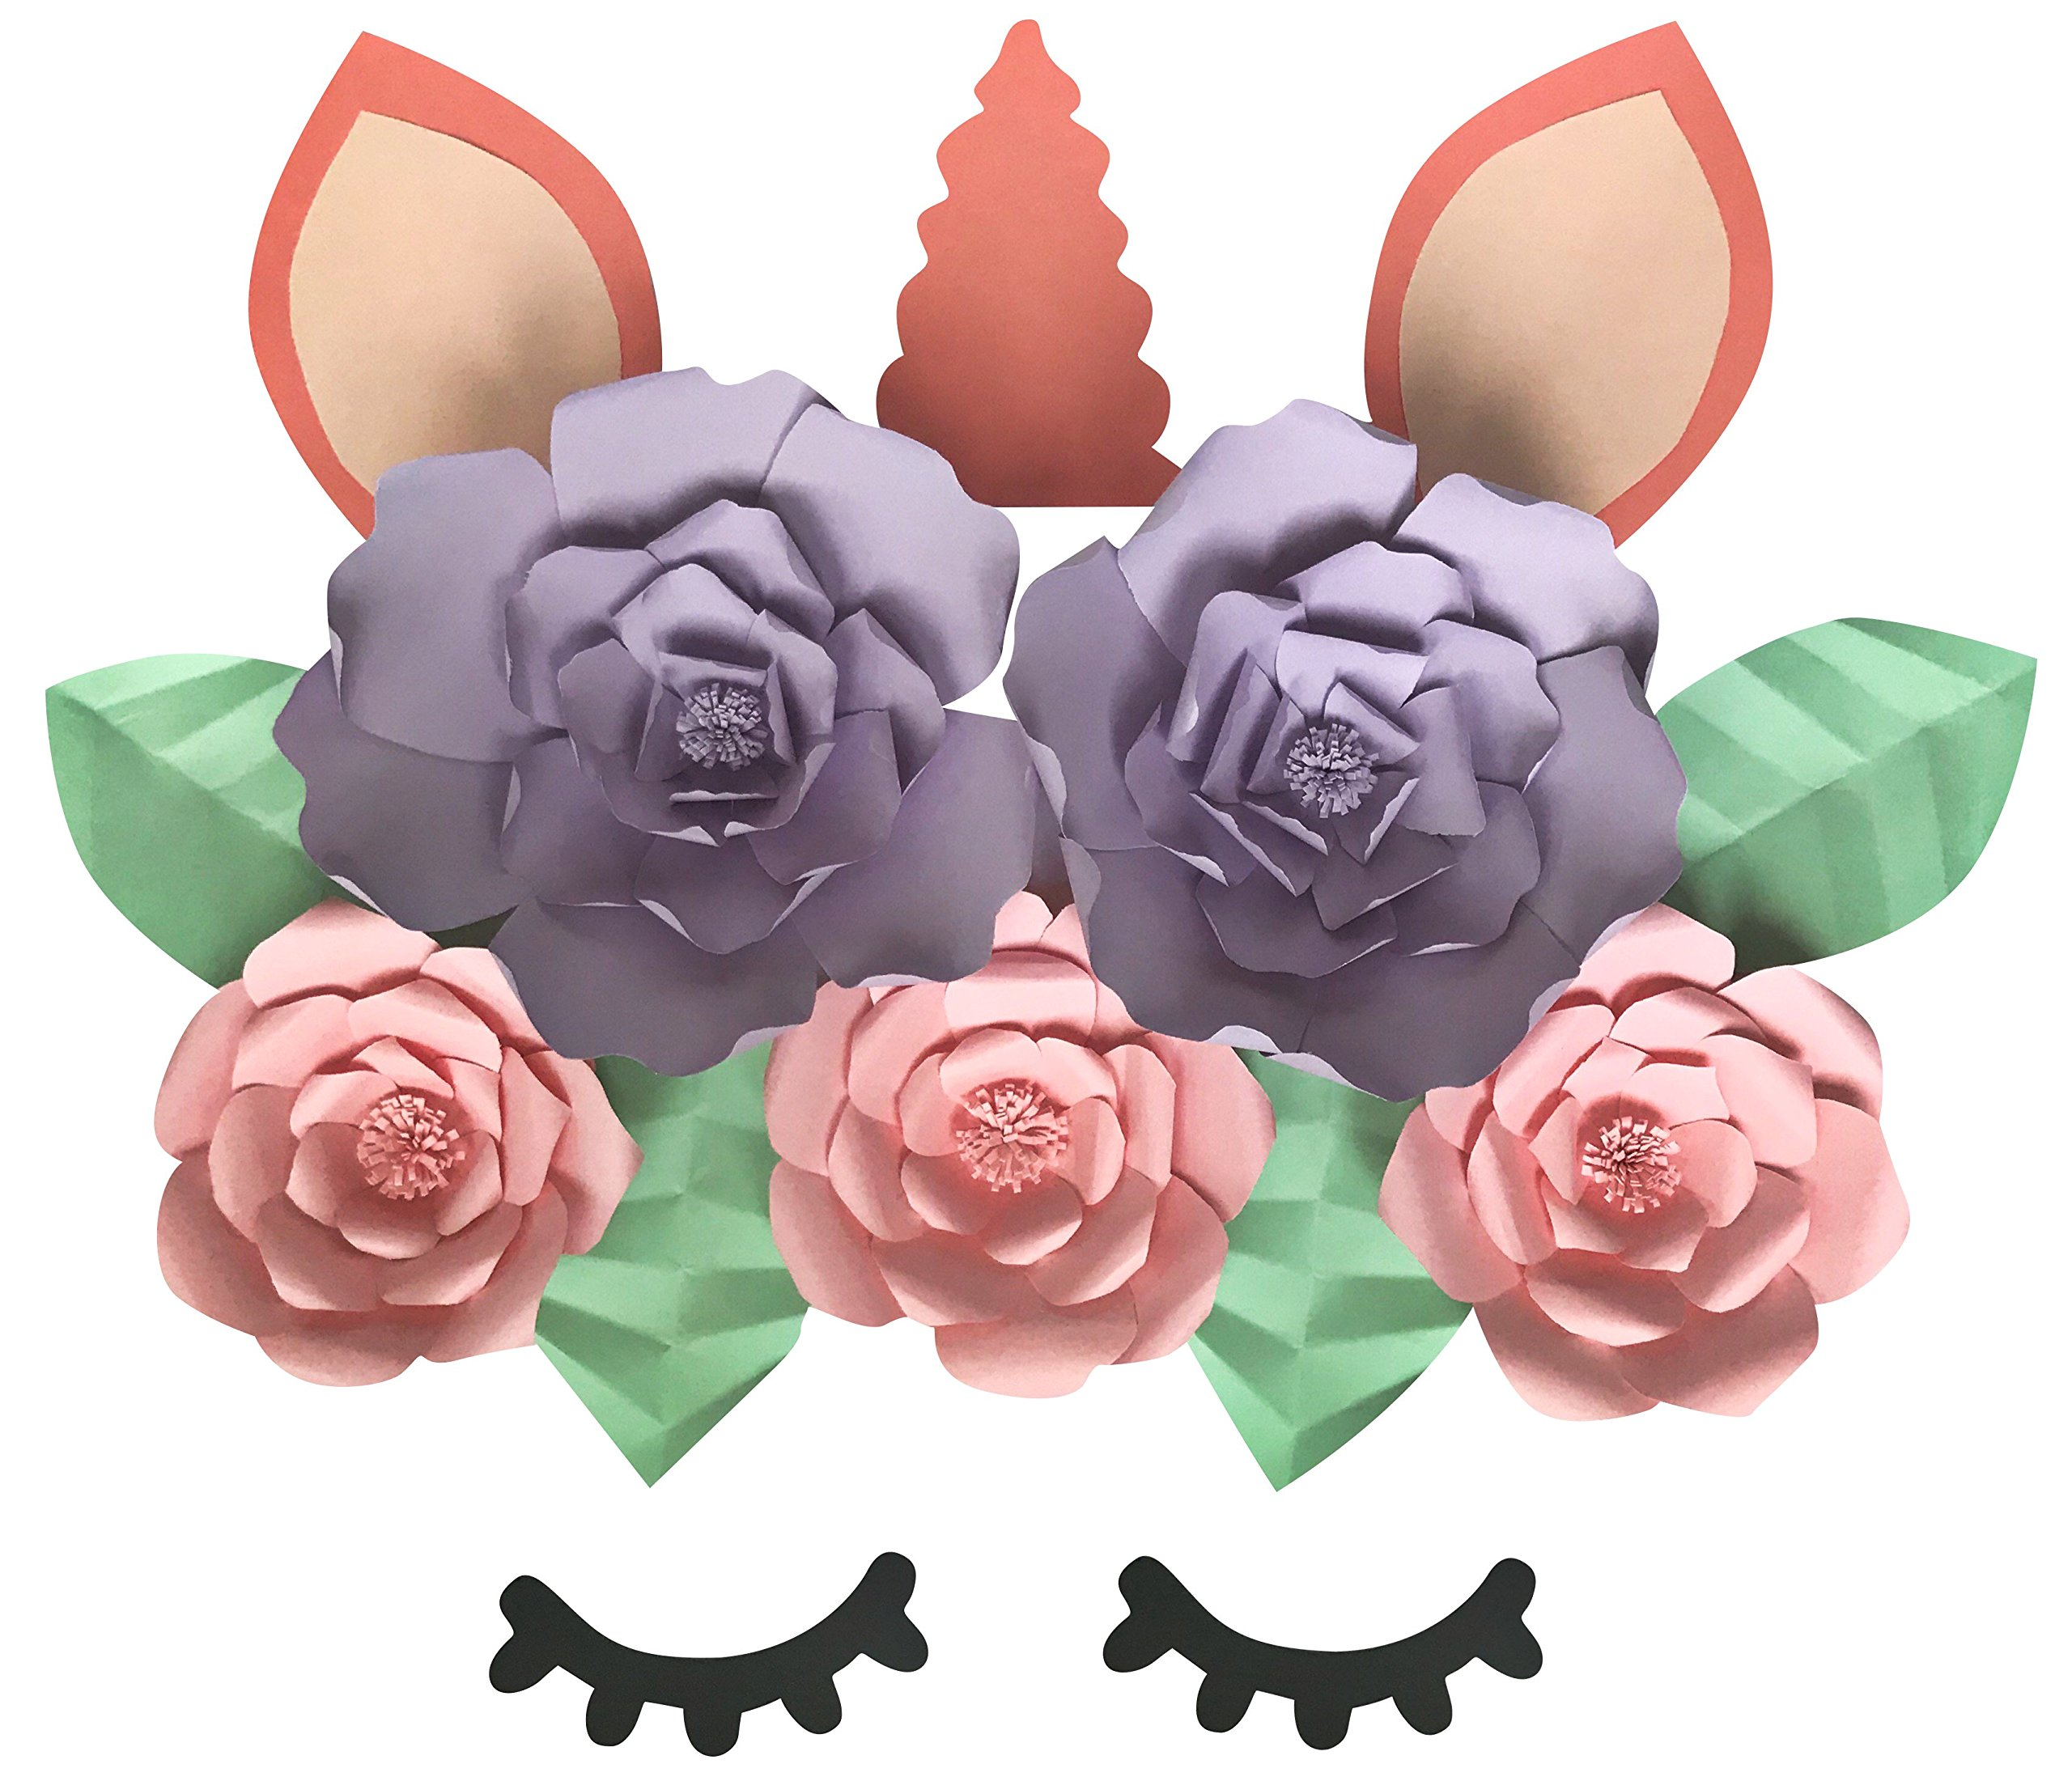 Unicorn Paper Flower Kit - DIY Unicorn Face Paper Flower Backdrop - 120 Piece Set - Unicorn Horn, Ears, and Lashes, 5 Flowers, 4 Leaves (Multi Color Unicorn Set)